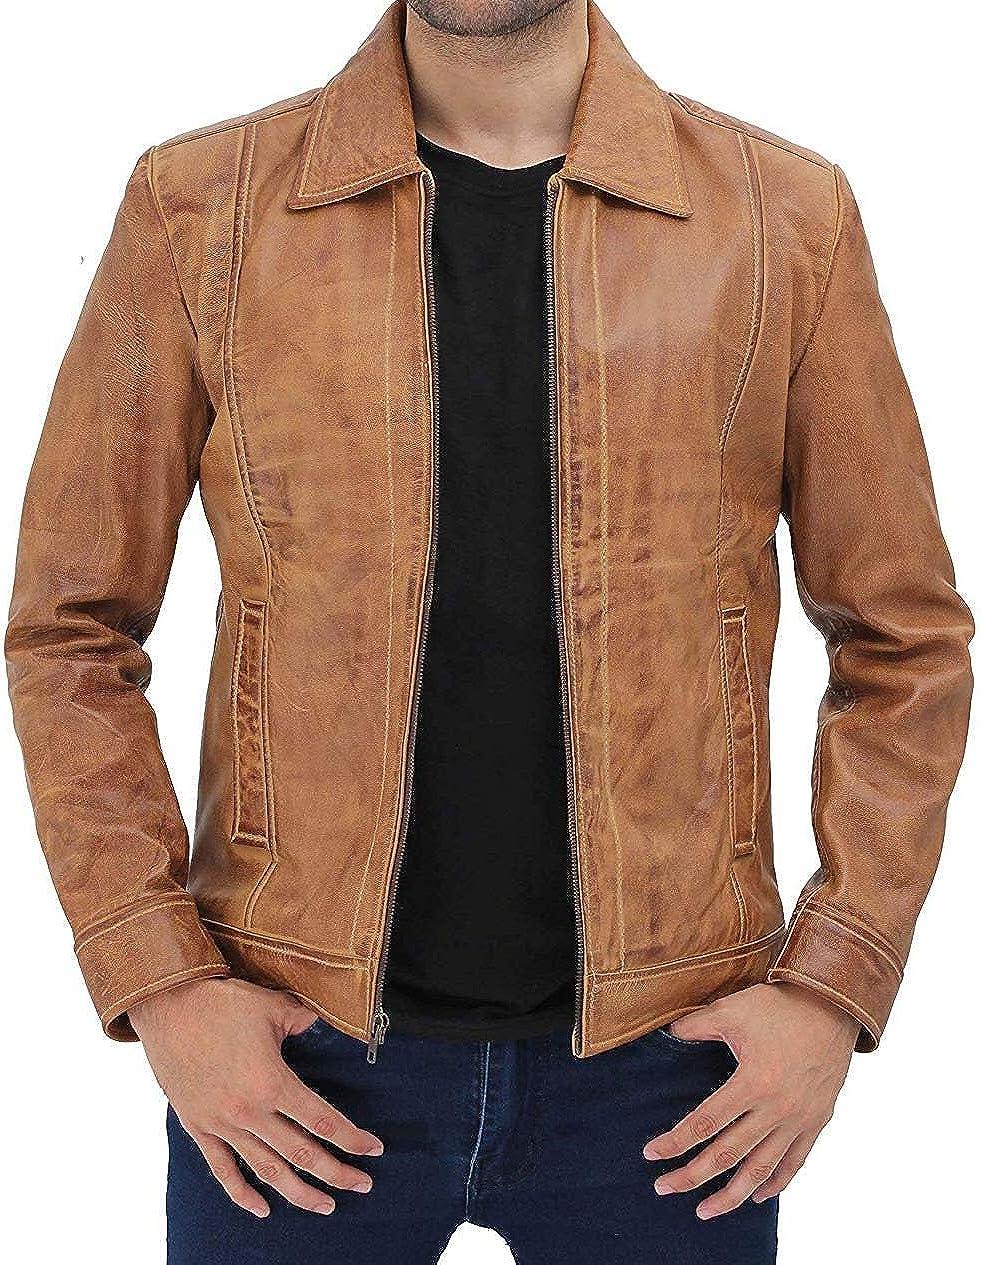 fjackets Leather Lightweight Jackets for Men - Vintage Style Shirt Collar Zip Up Jacket